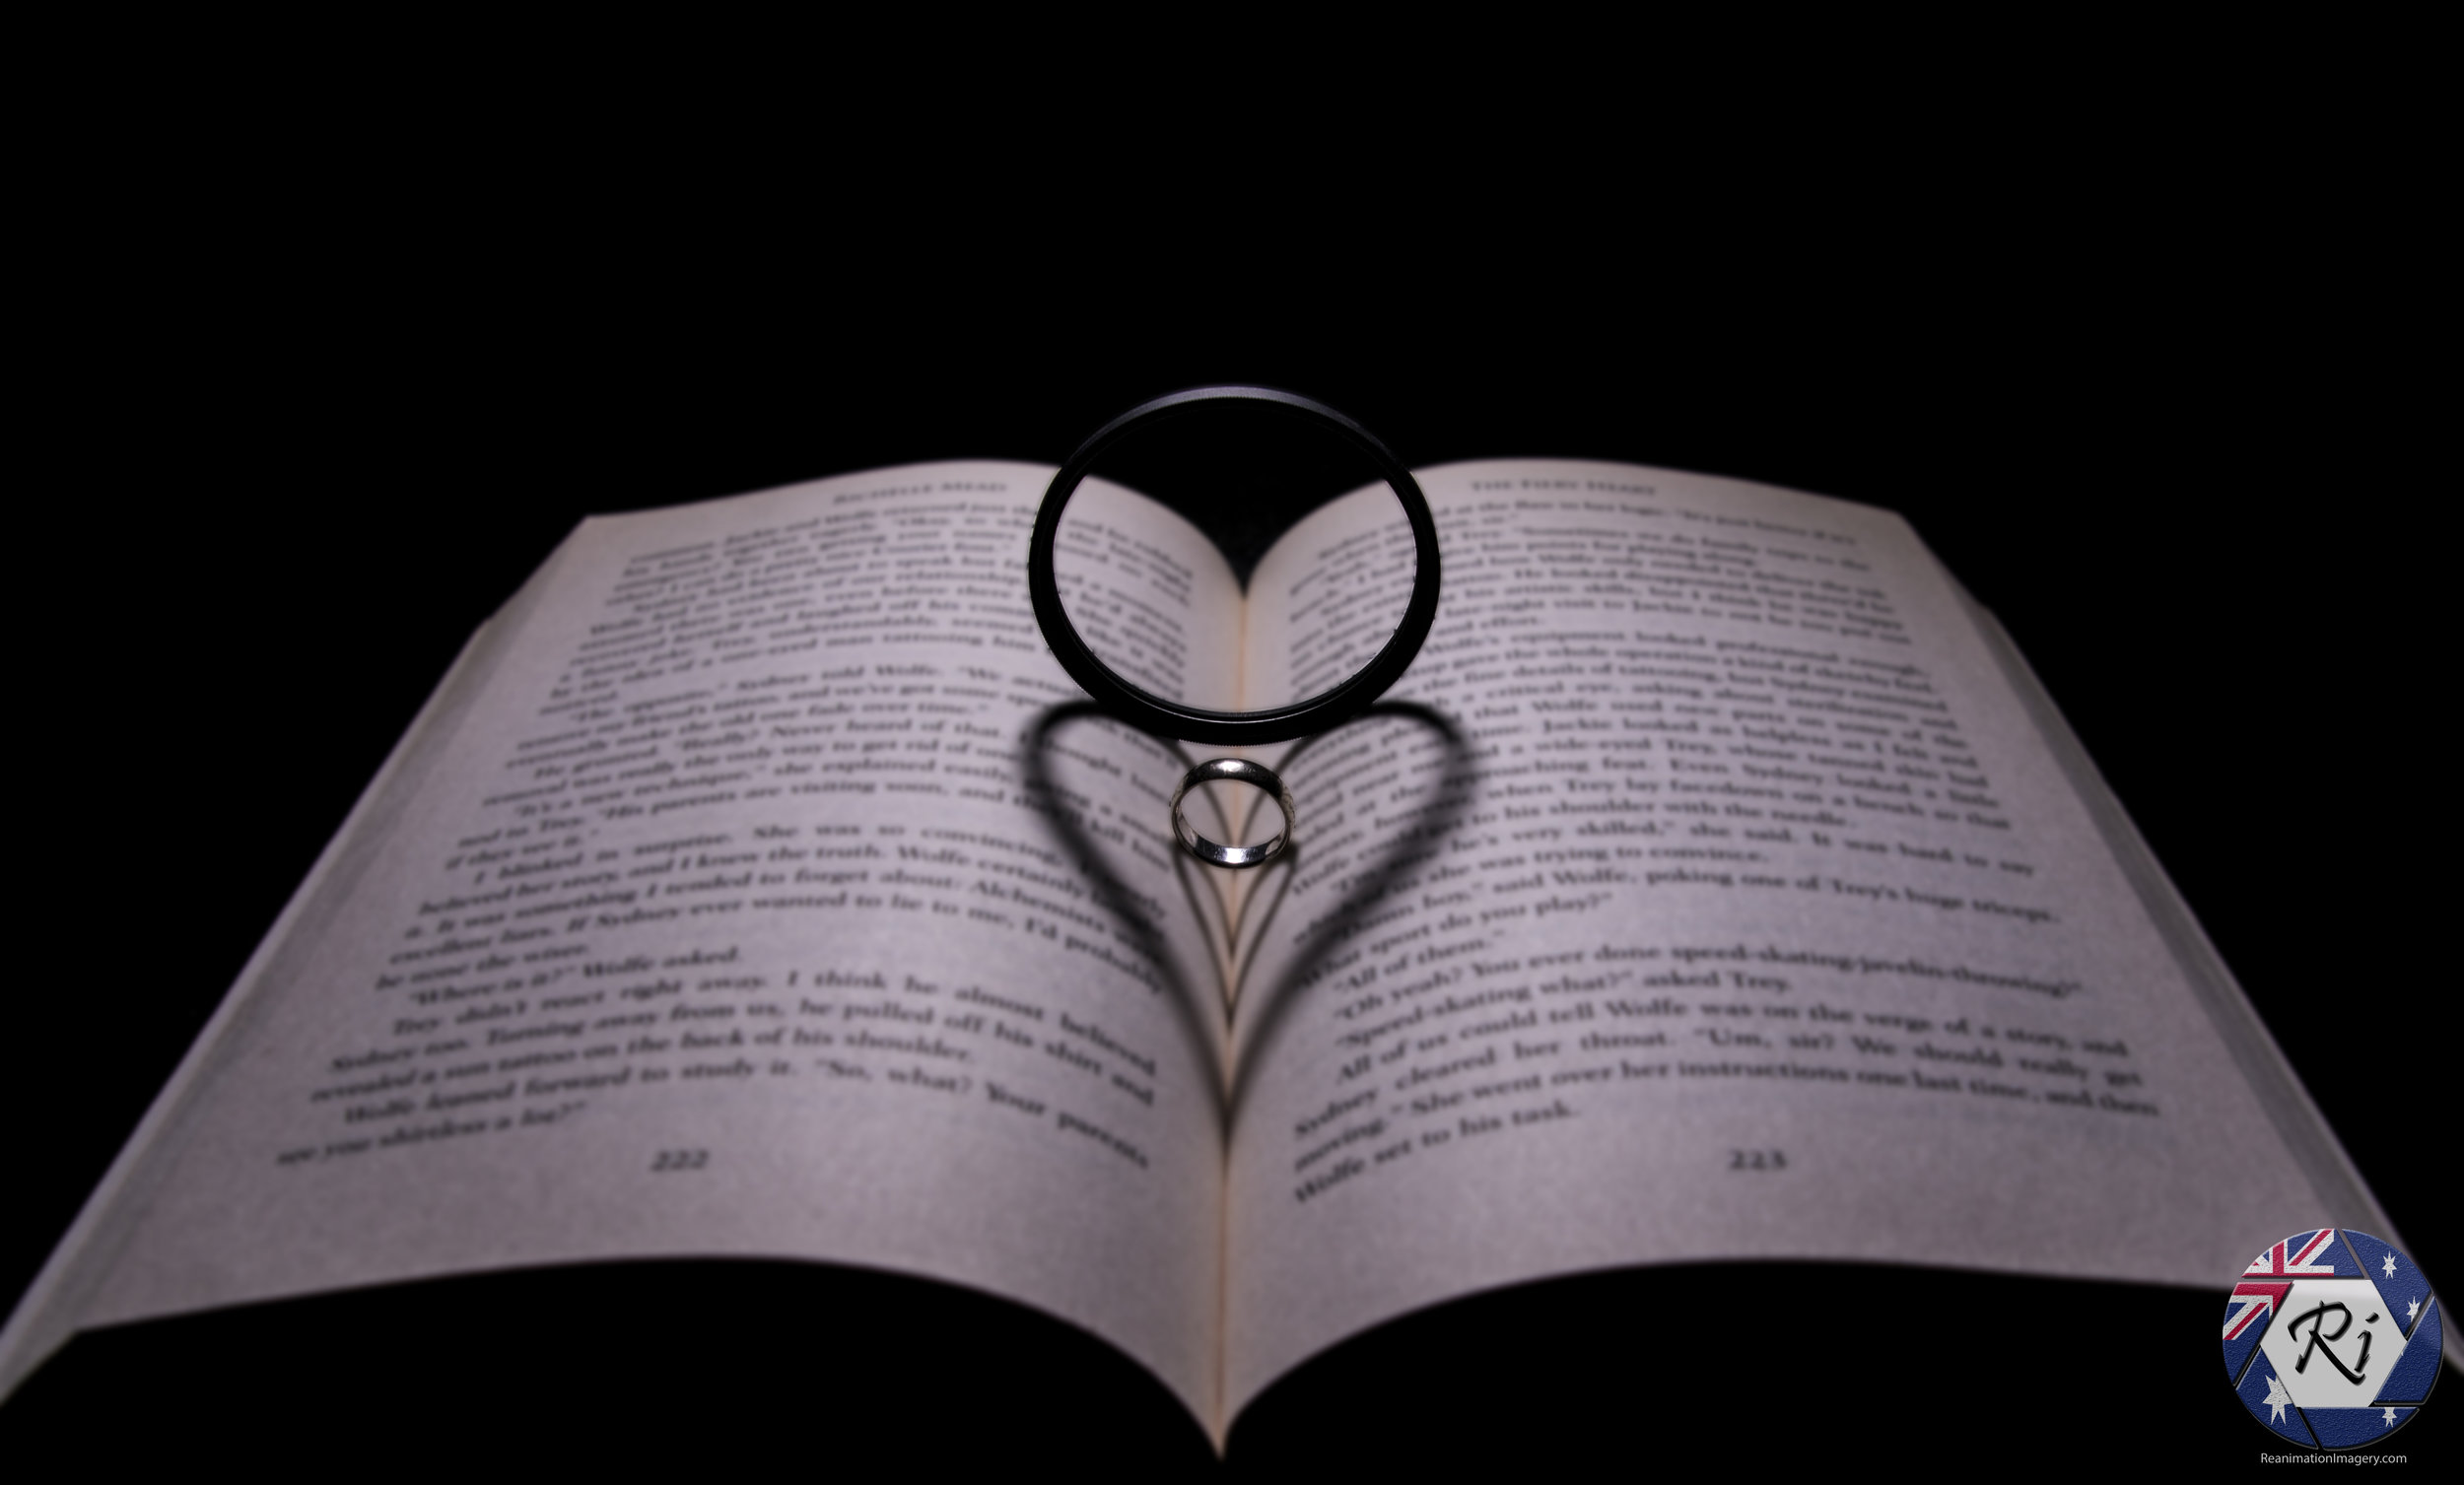 stock-photo-love-a-good-book-86056743.jpg